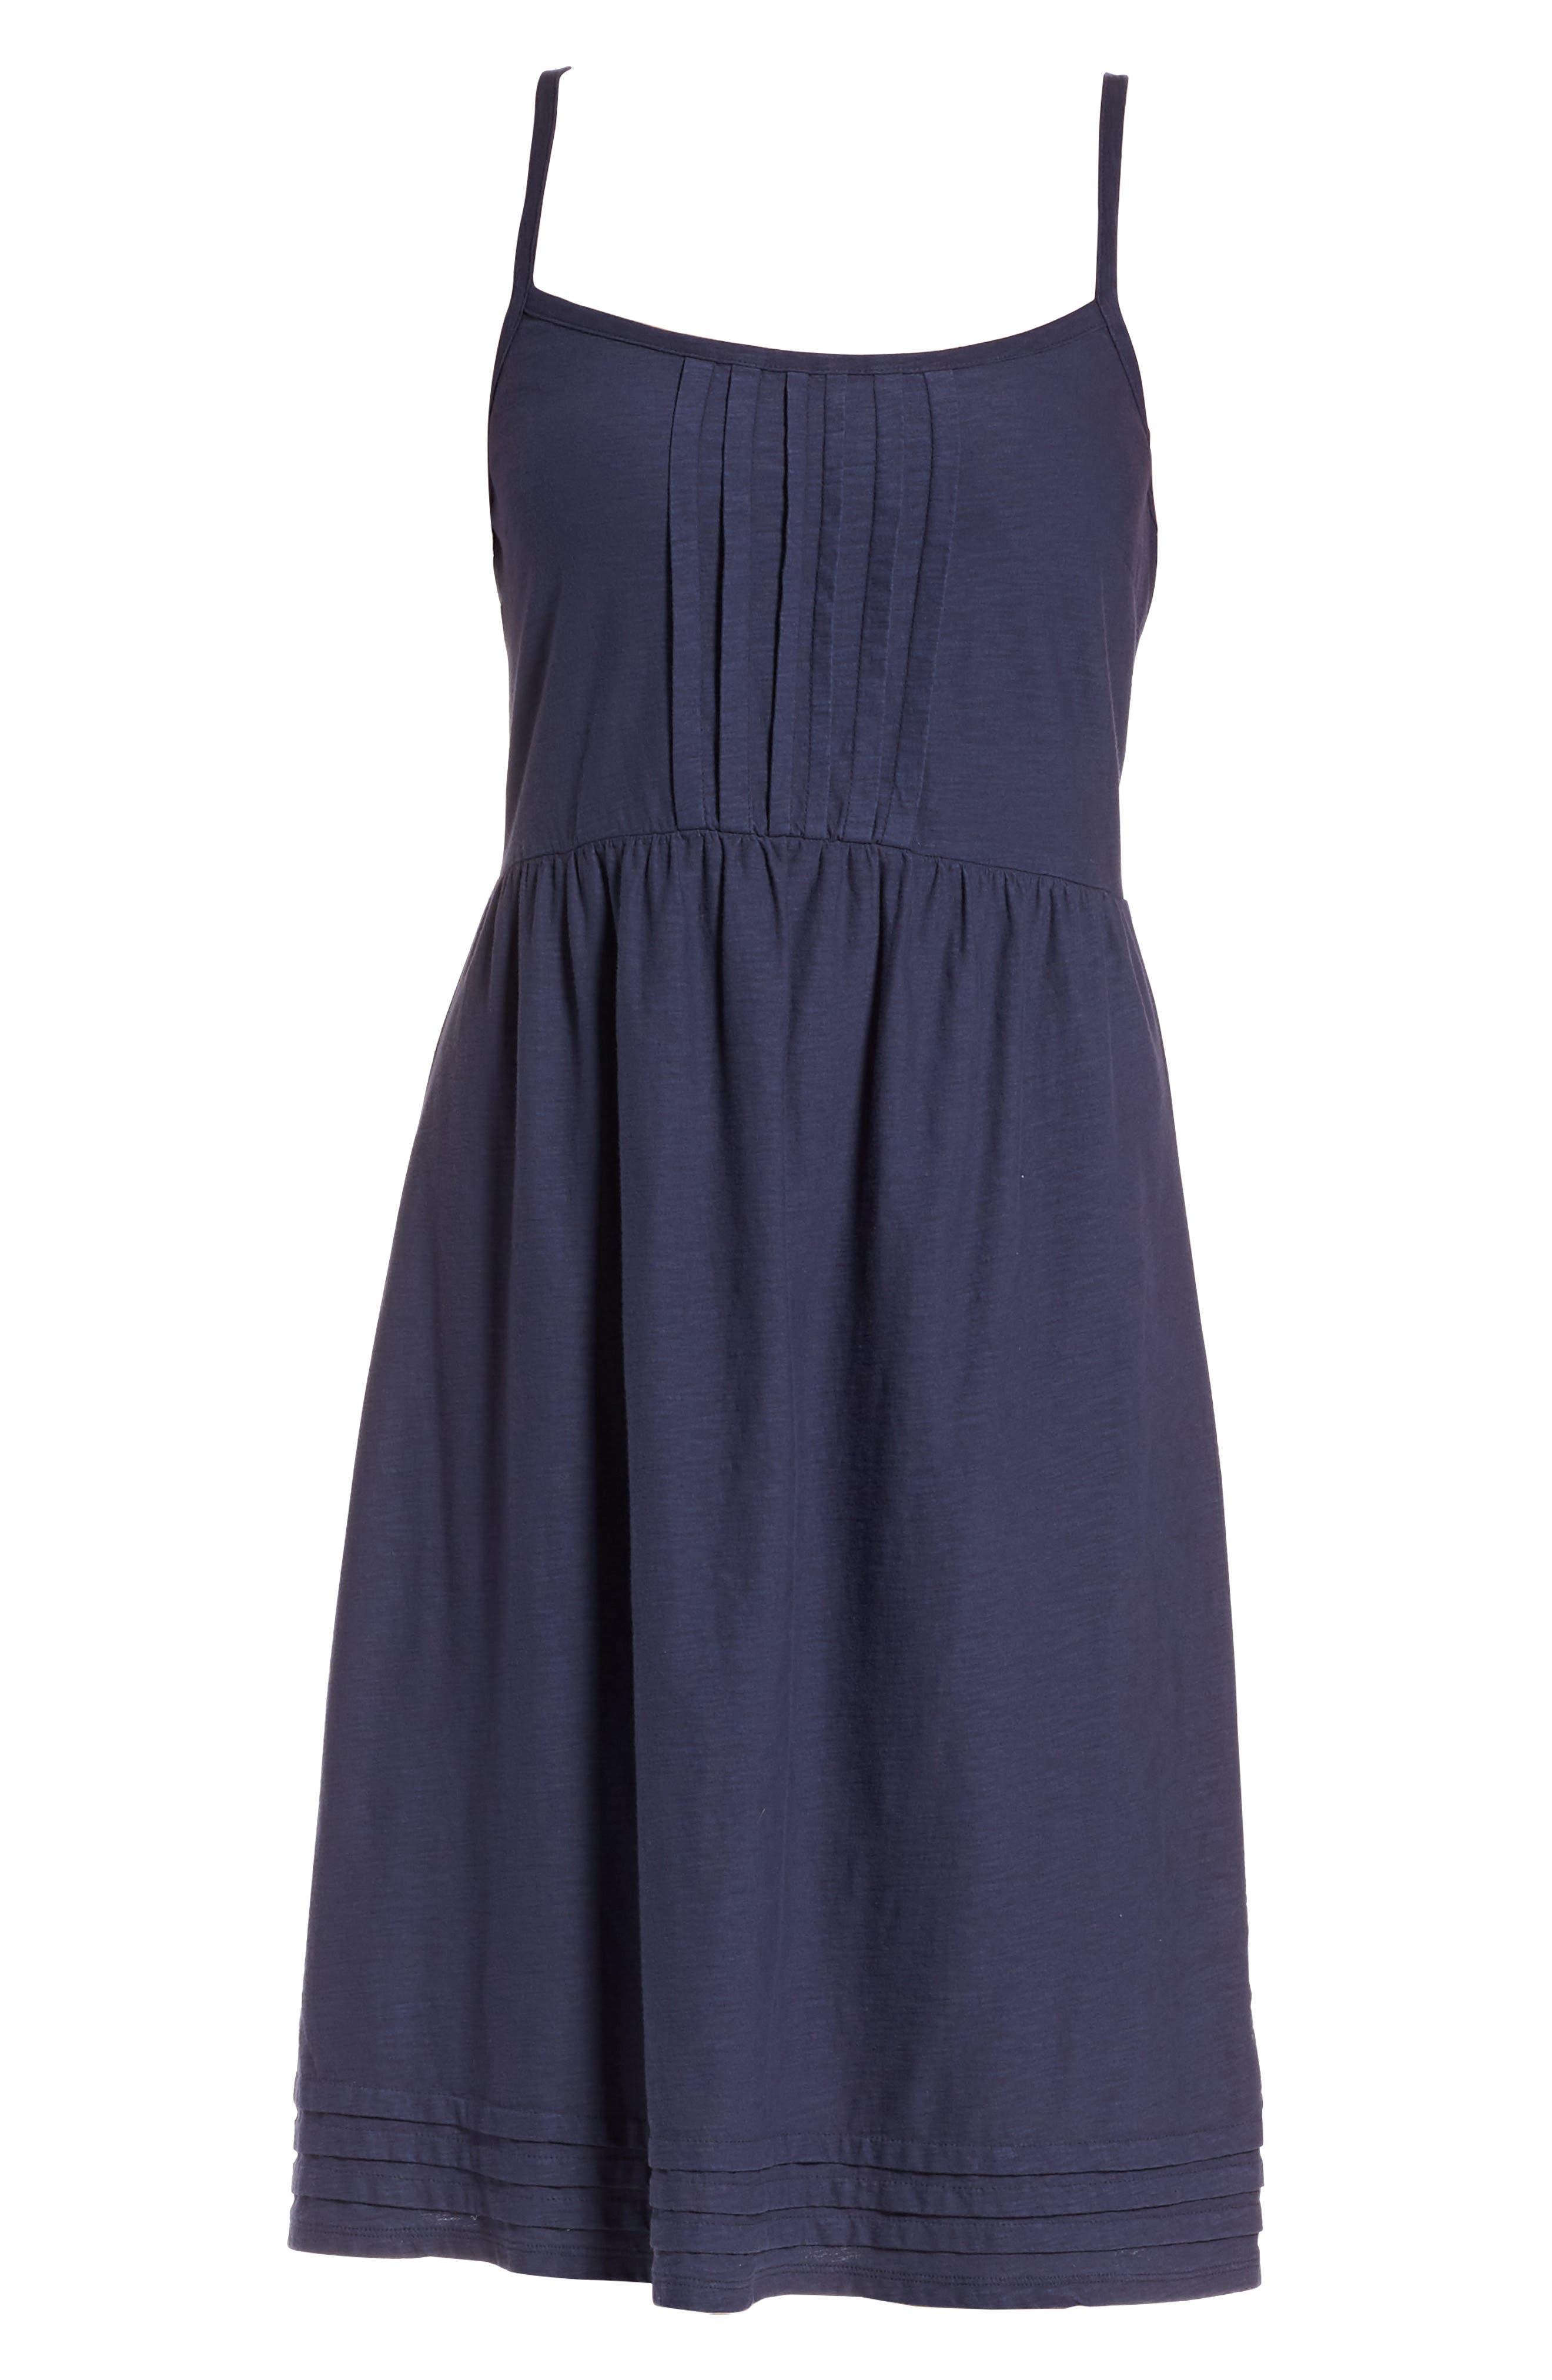 Arden Pleat Jersey Sundress,                             Alternate thumbnail 6, color,                             400